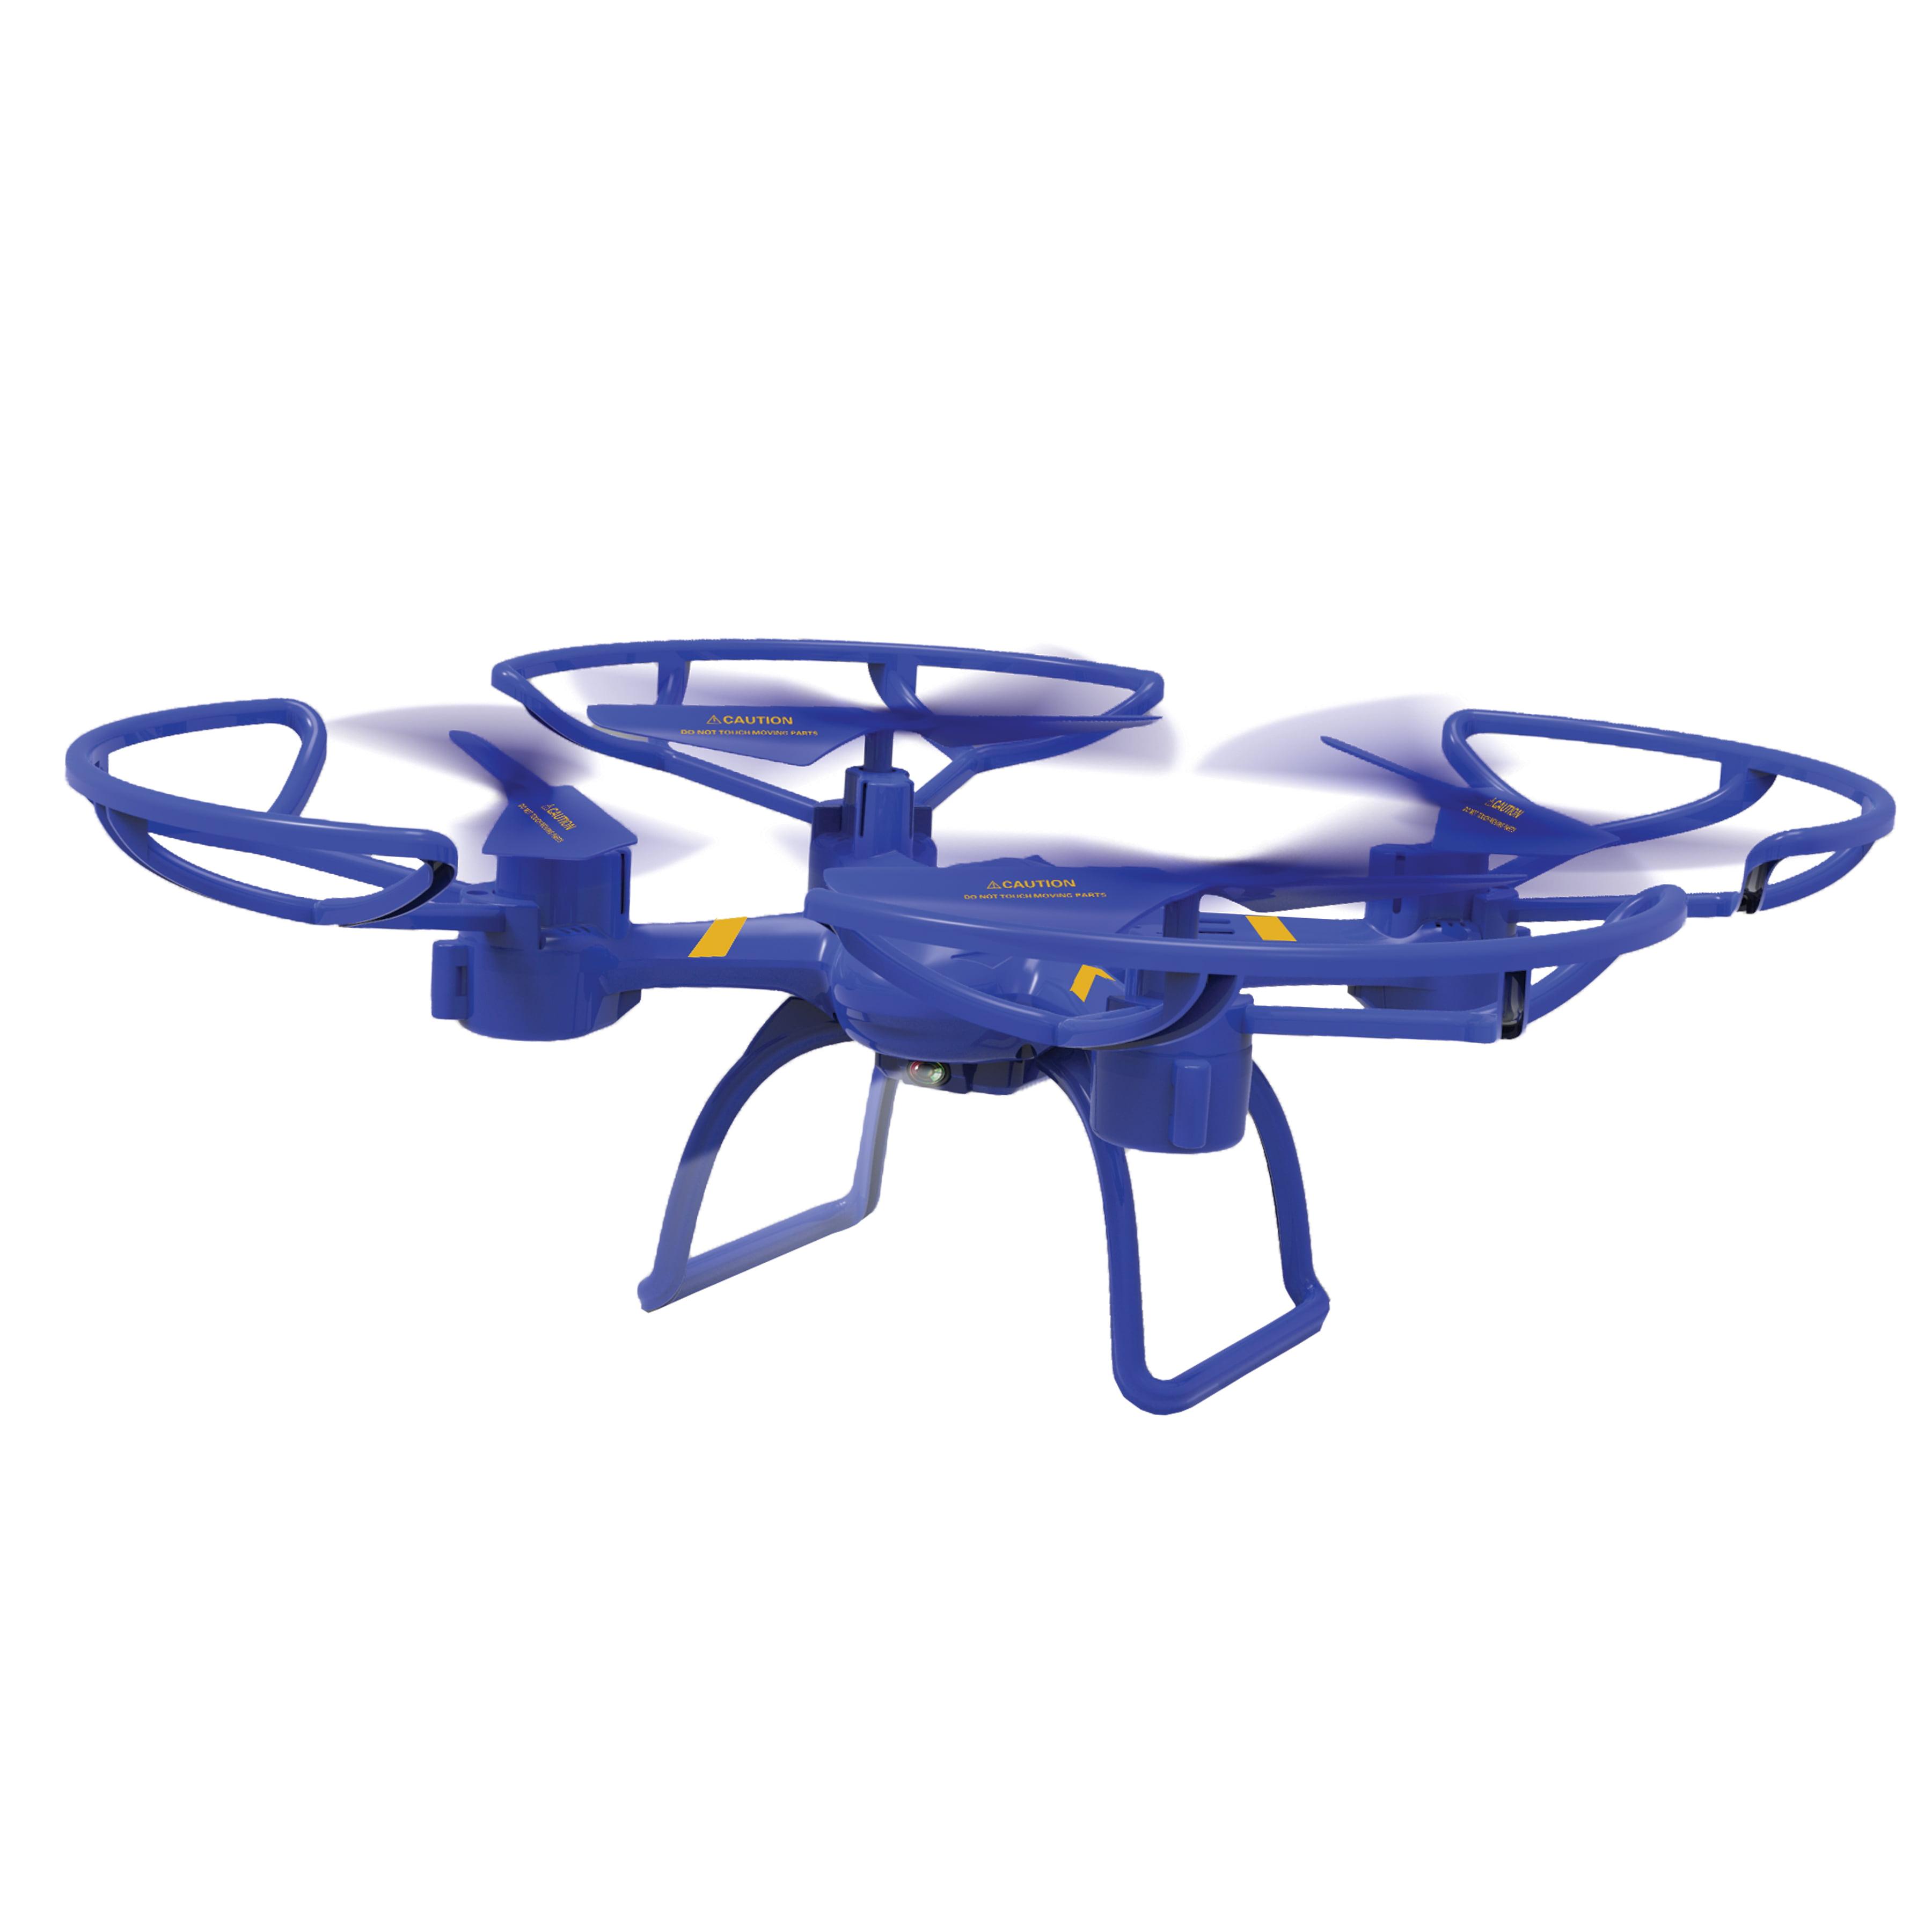 Polaroid PL1200 Camera Drone Blue by Polaroid